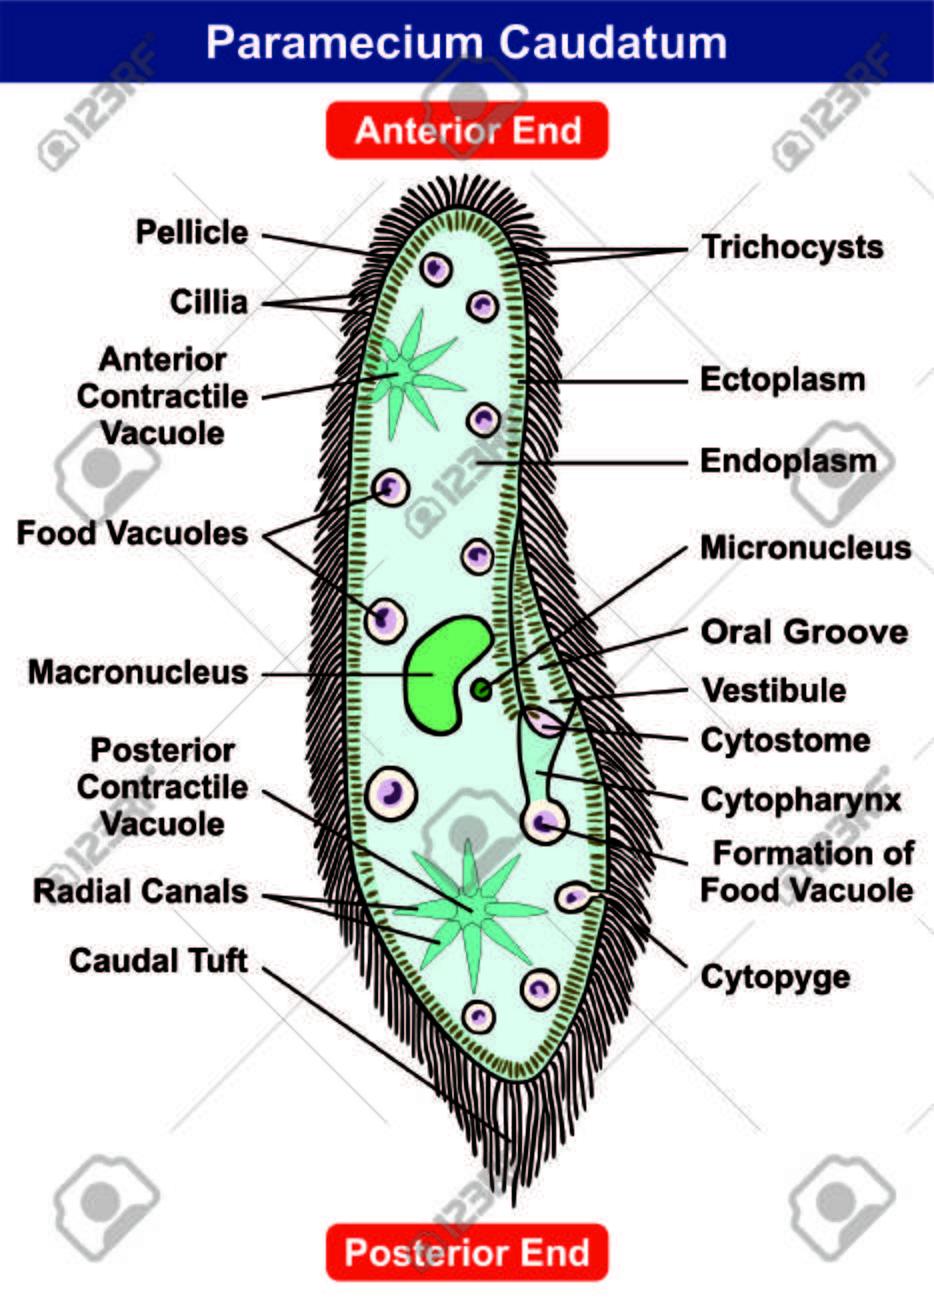 hight resolution of paramecium caudatum diagram single celled protists animal royalty protist bacteria virus venn diagram animal and protist diagram